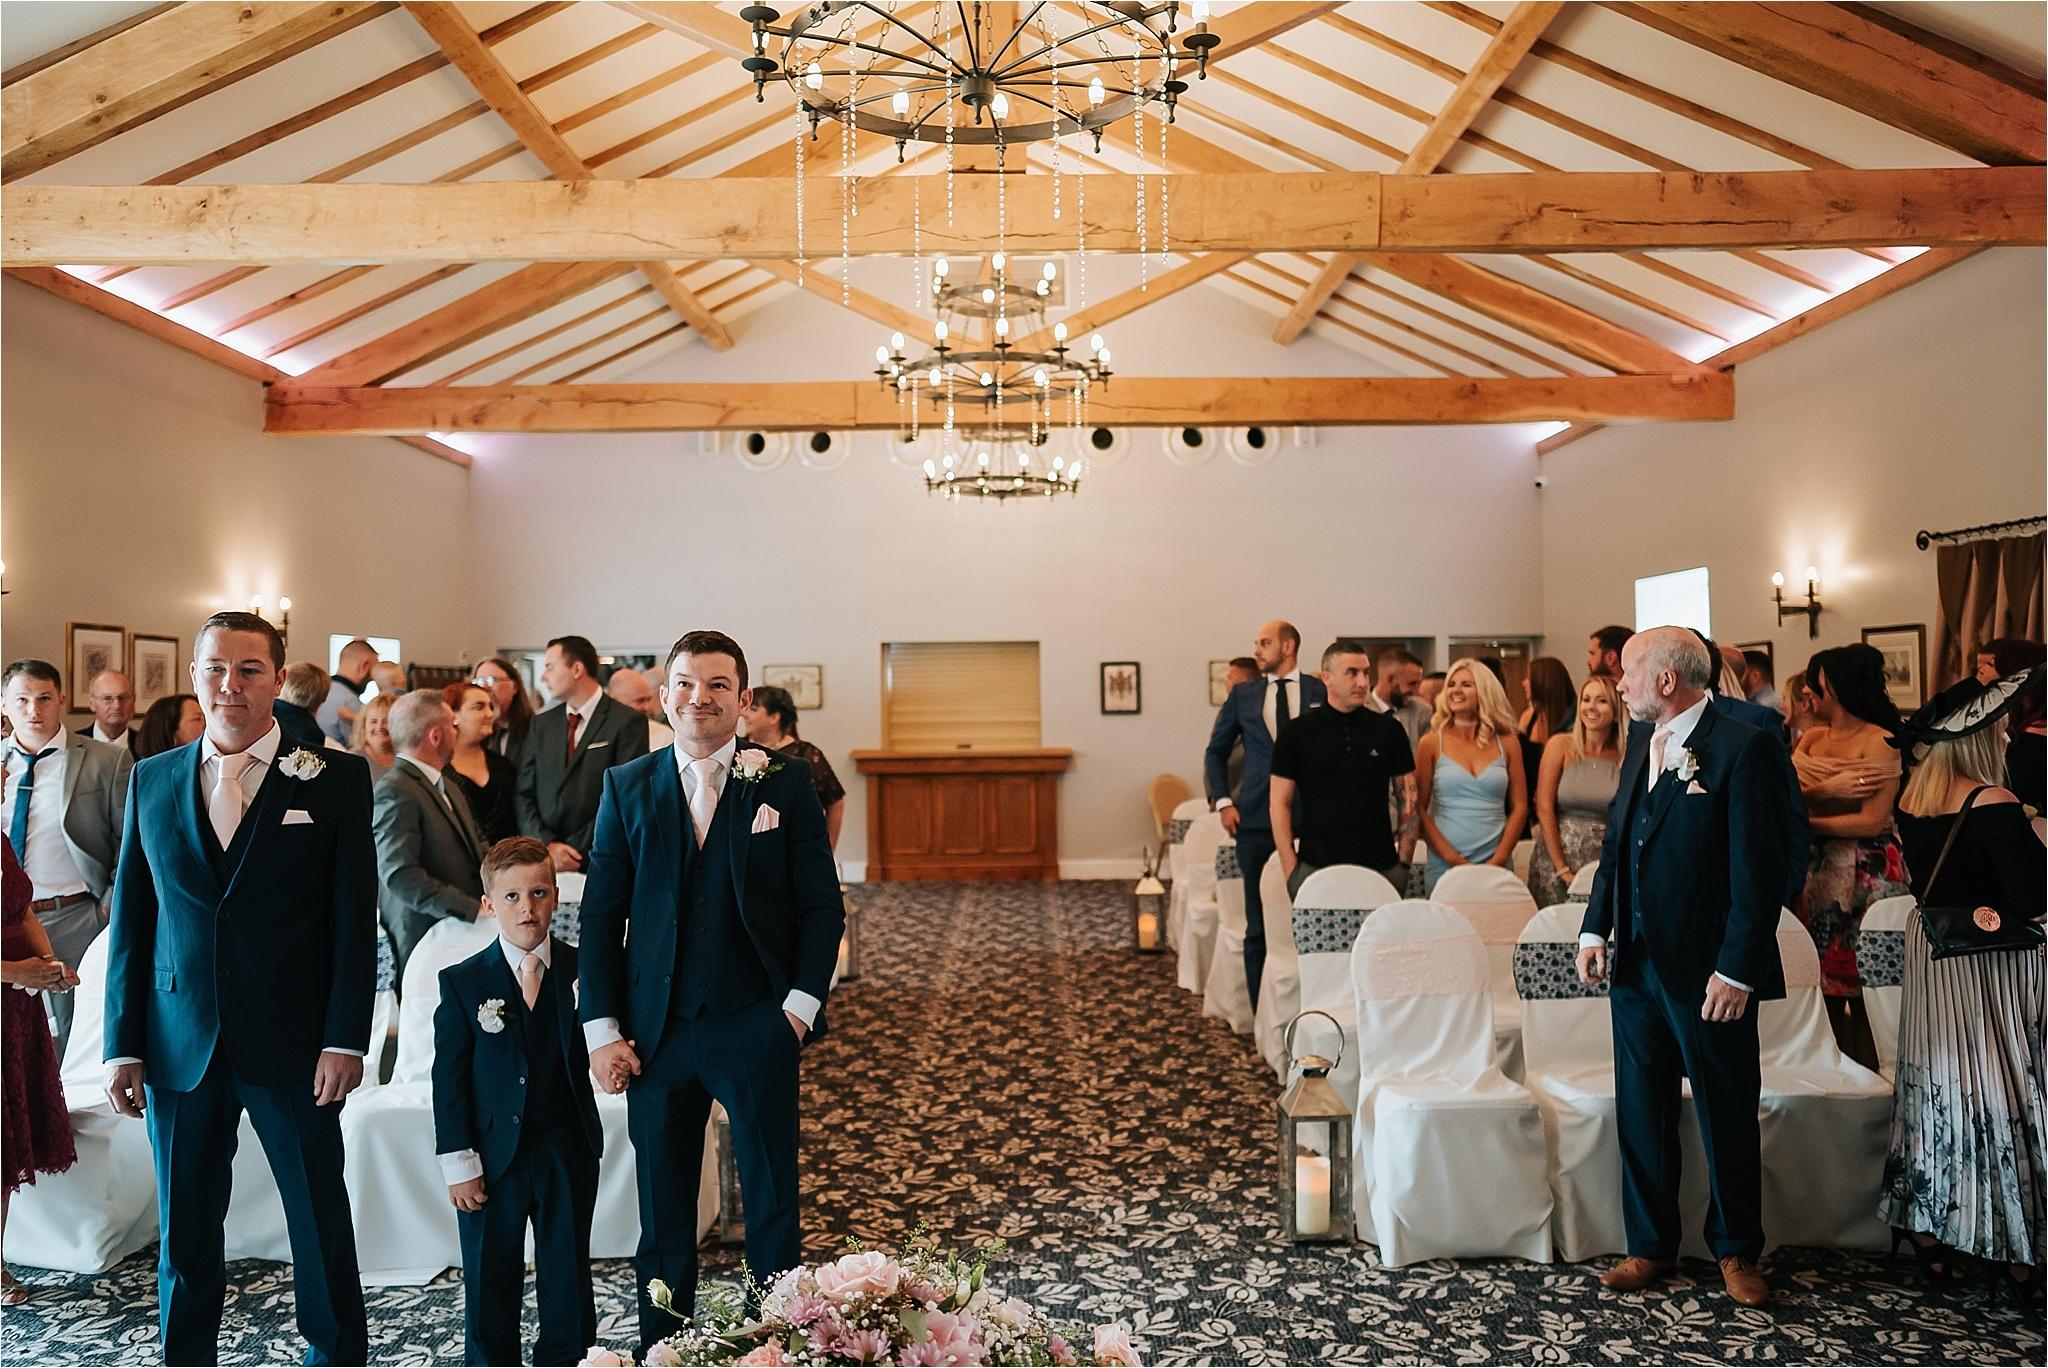 thevilla+lancashire+wreagreen+wedding+photographer96.jpg